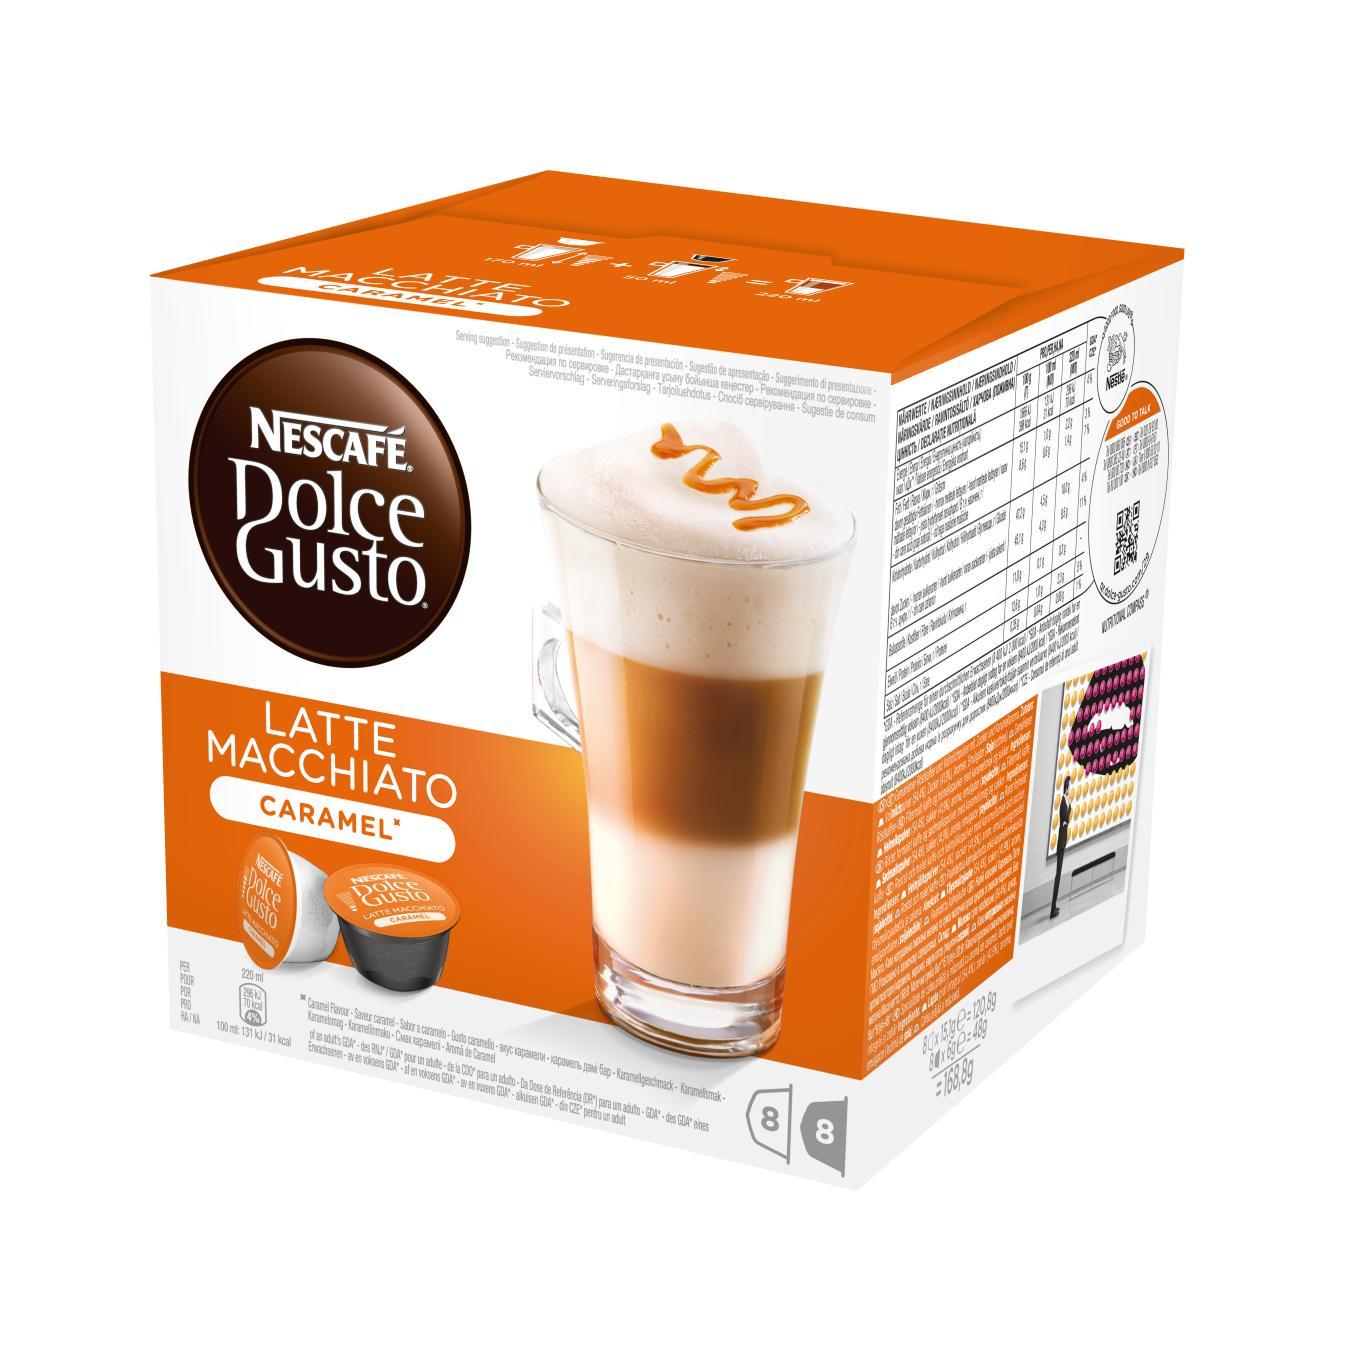 Кофе в капсулах Nescafe Dolce Gusto Latte Macchiato Caramel 16 капсул